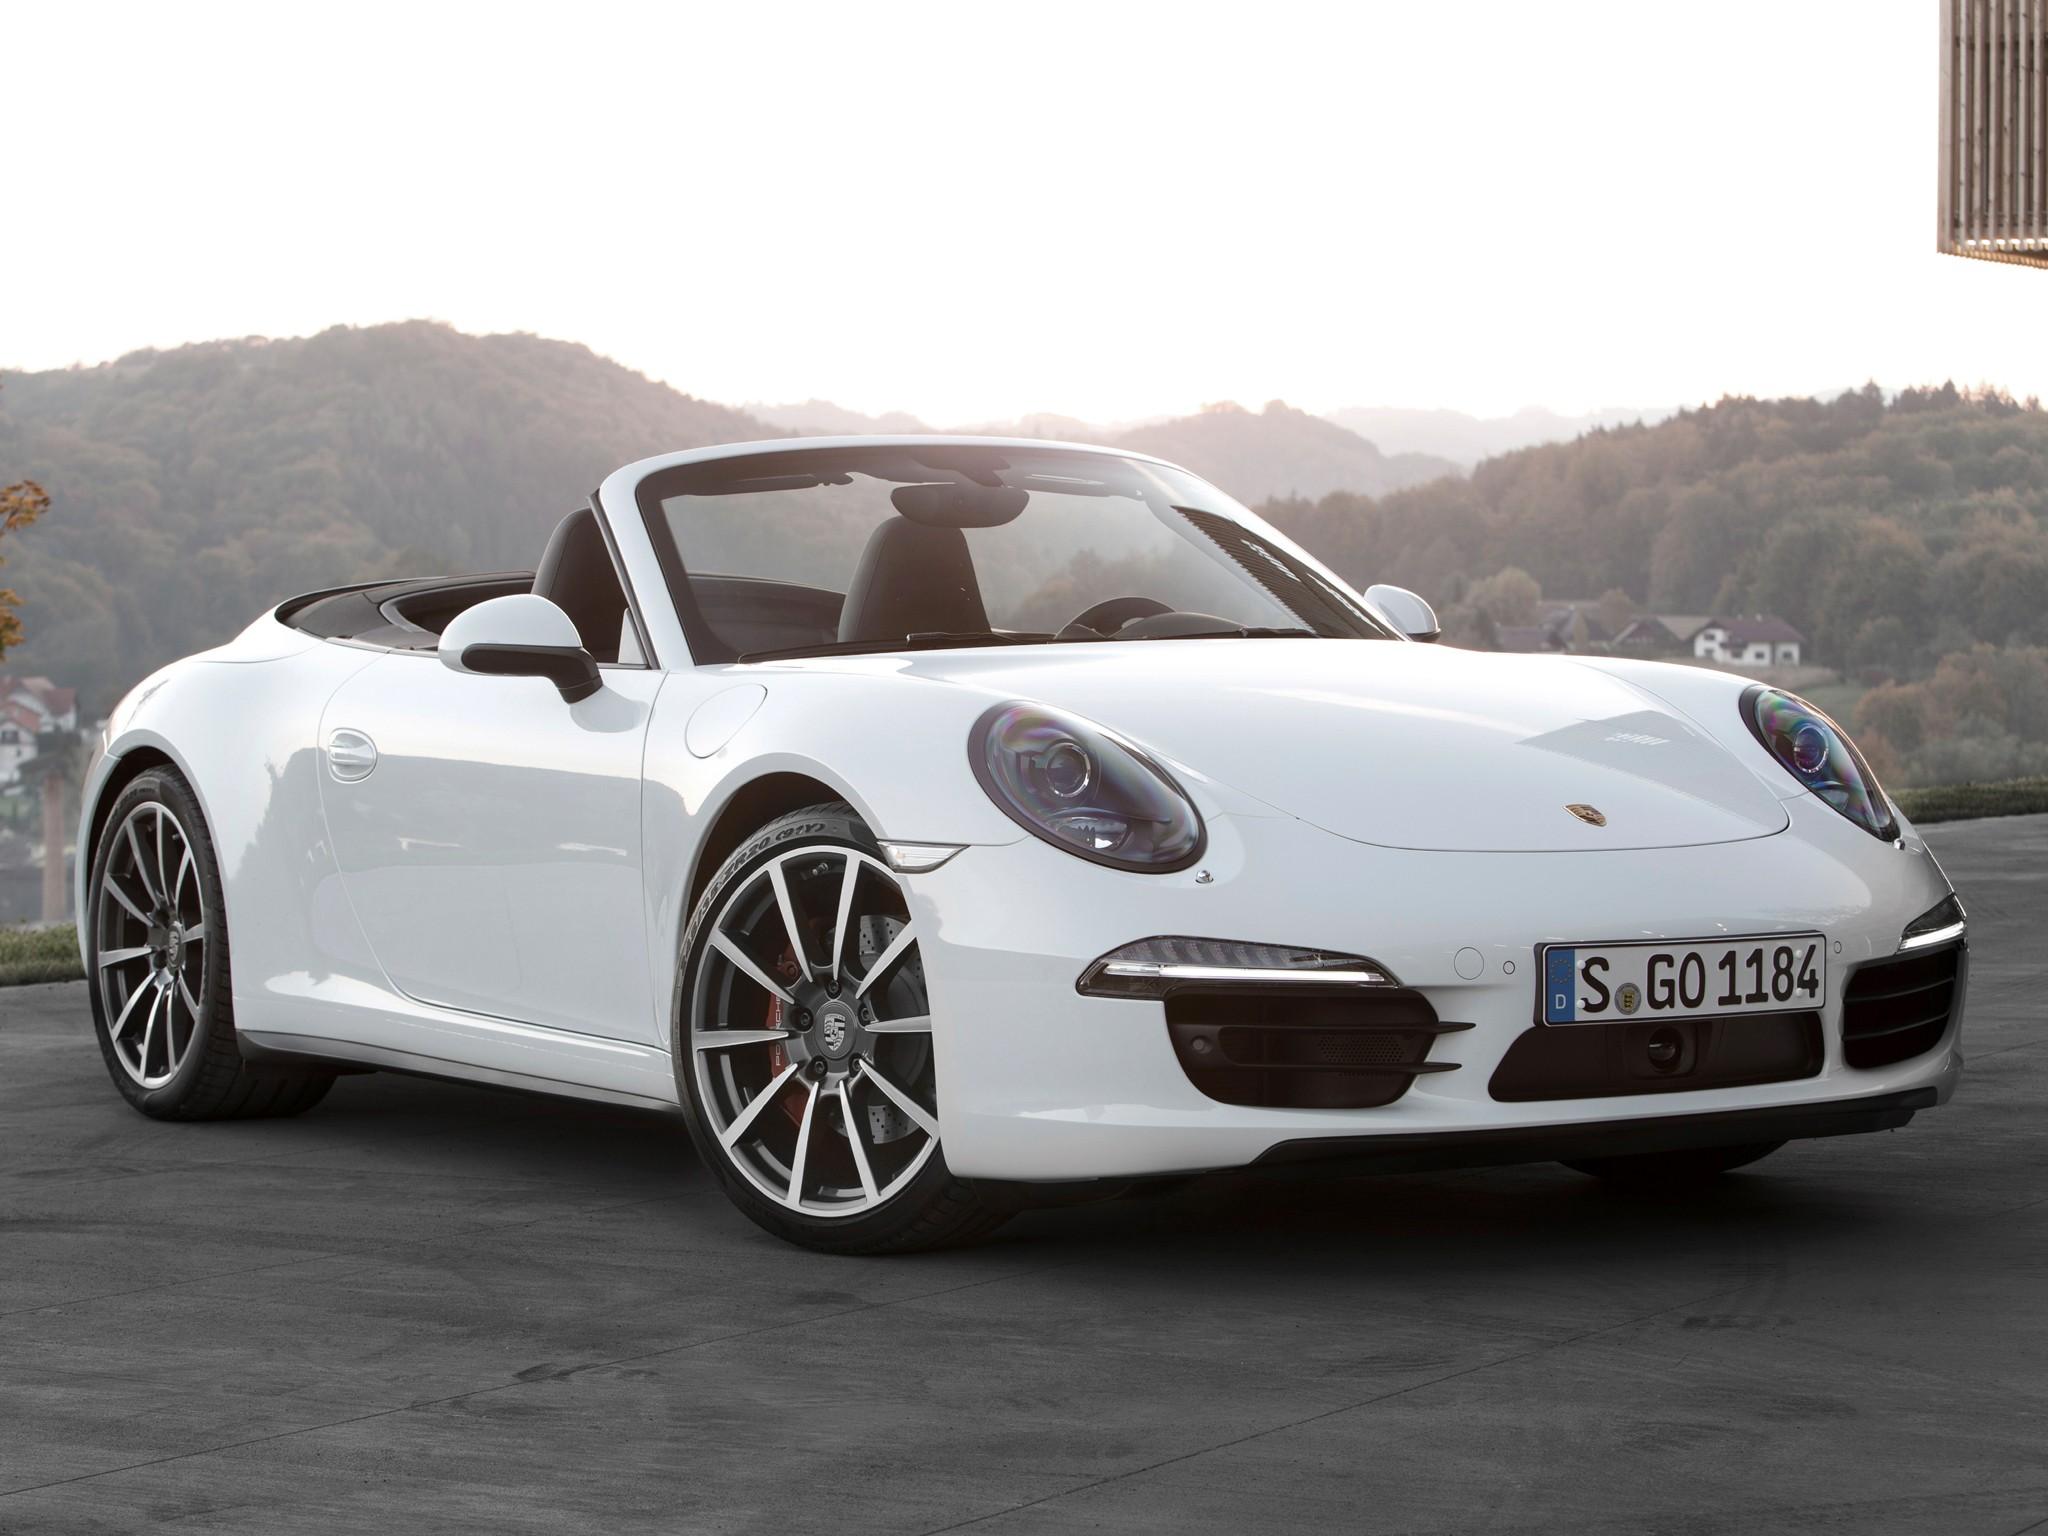 porsche 911 carrera 4s cabriolet 991 specs 2012 2013 2014 2015 2016 2017 autoevolution. Black Bedroom Furniture Sets. Home Design Ideas